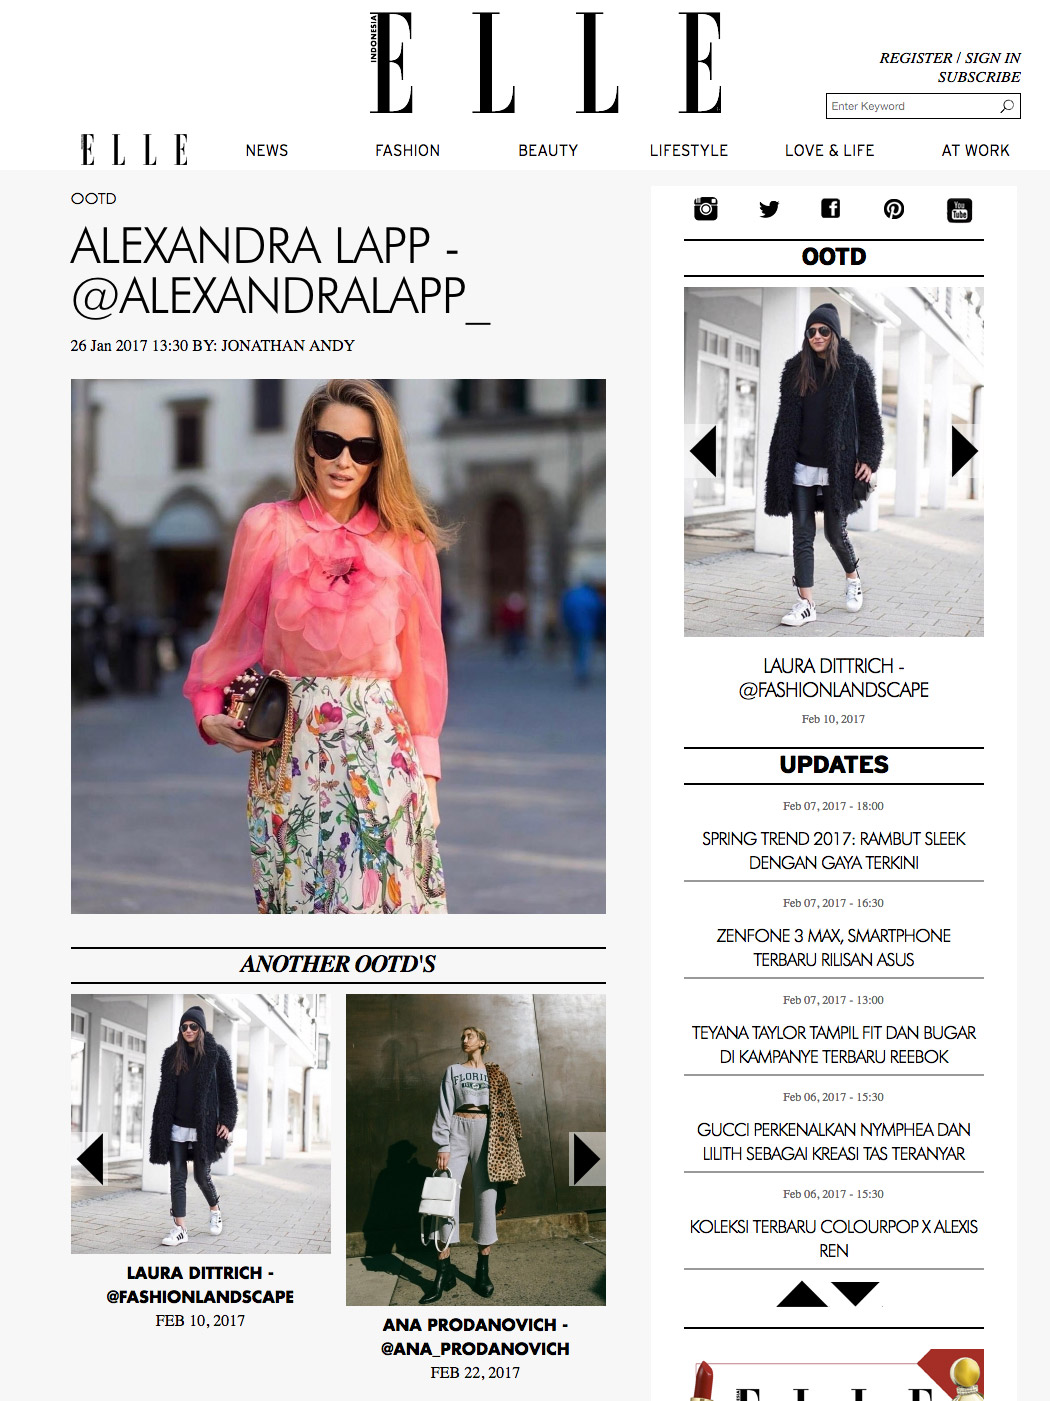 Alexandra Lapp Street Style - Found on http://www.elle.co.id/ootd/alexandra-lapp-alexandralapp-3